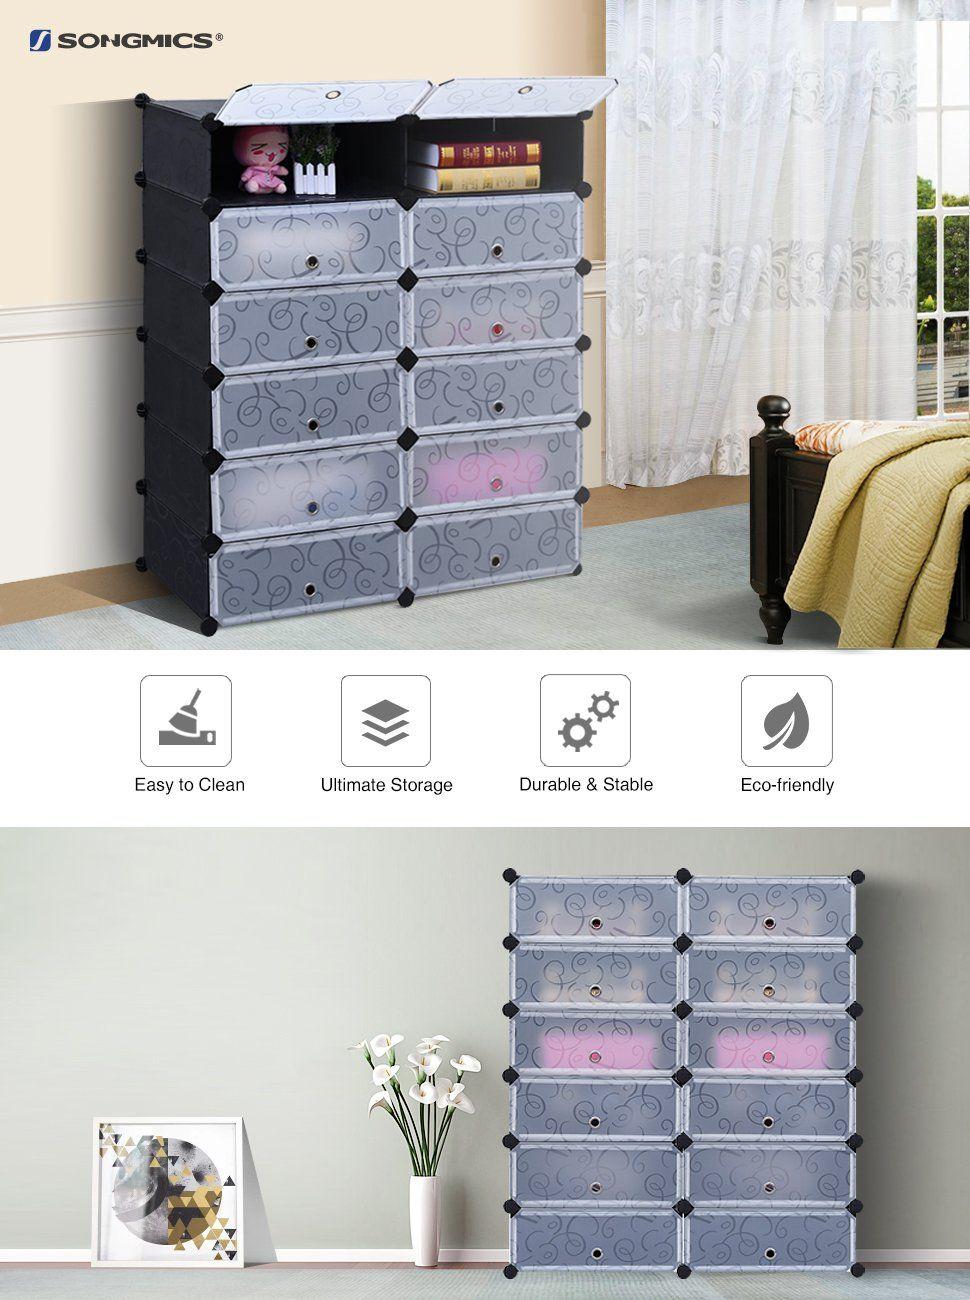 Songmics Diy Shoe Rack 12 Cube Shoe Cabinet Plastic Shoe Storage Organizer With Doors Black Ulpc26h Shoe Organization Diy Shoe Storage Organiser Diy Shoe Rack